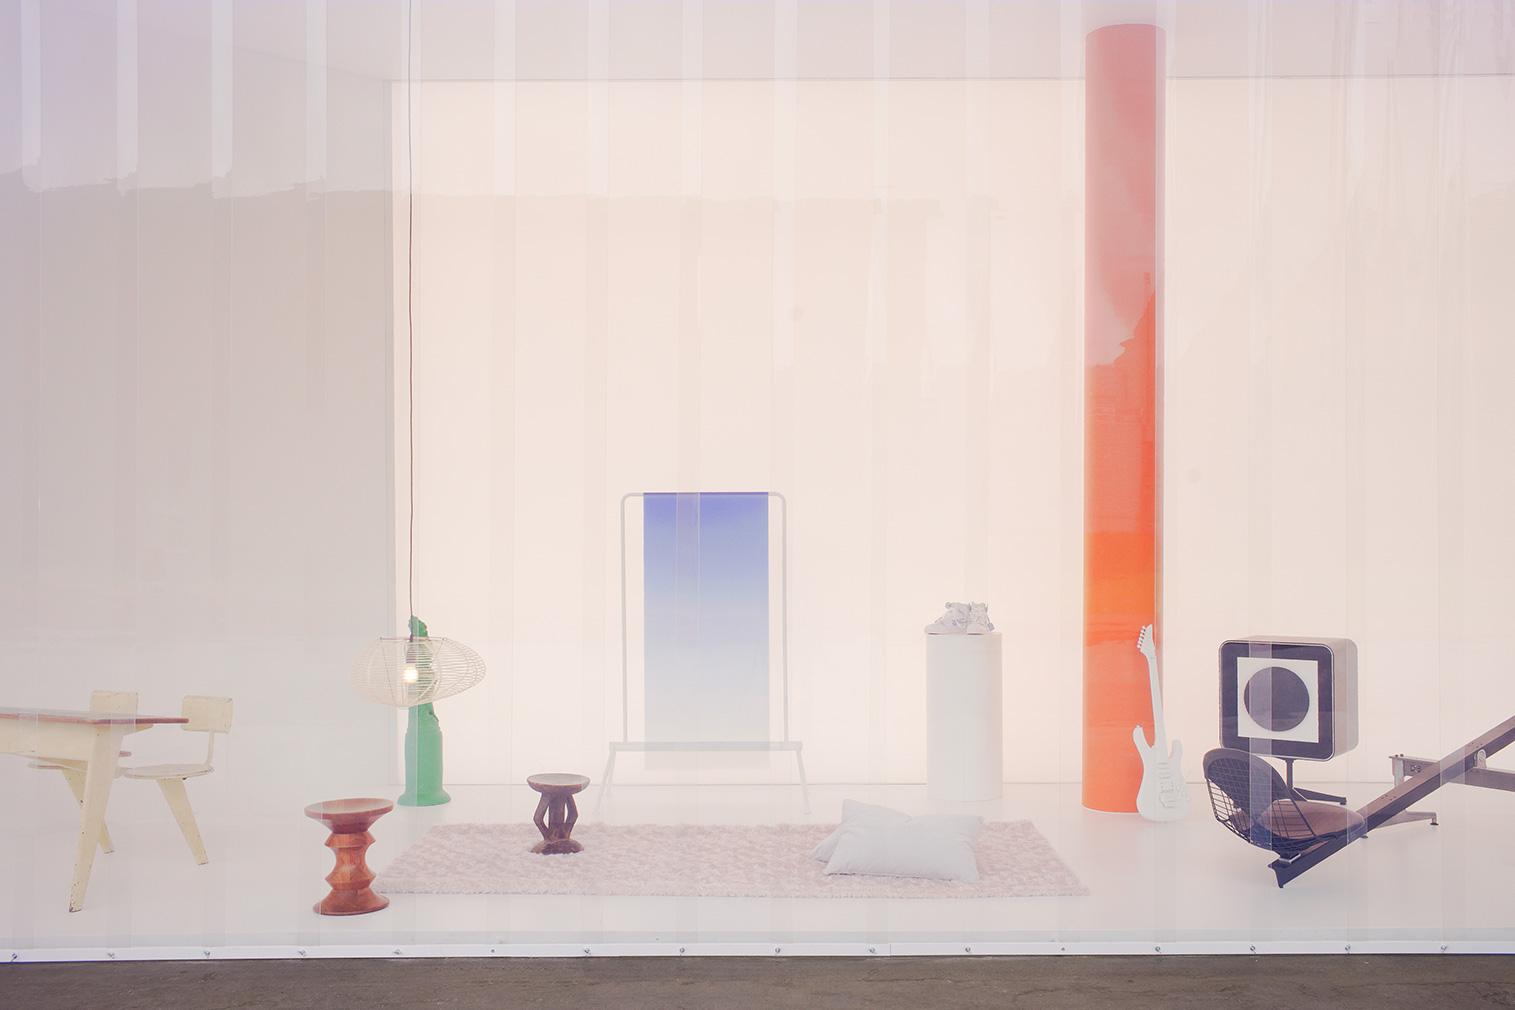 Virgil Abloh x Vitra installation. Photography: Julien Lanoo